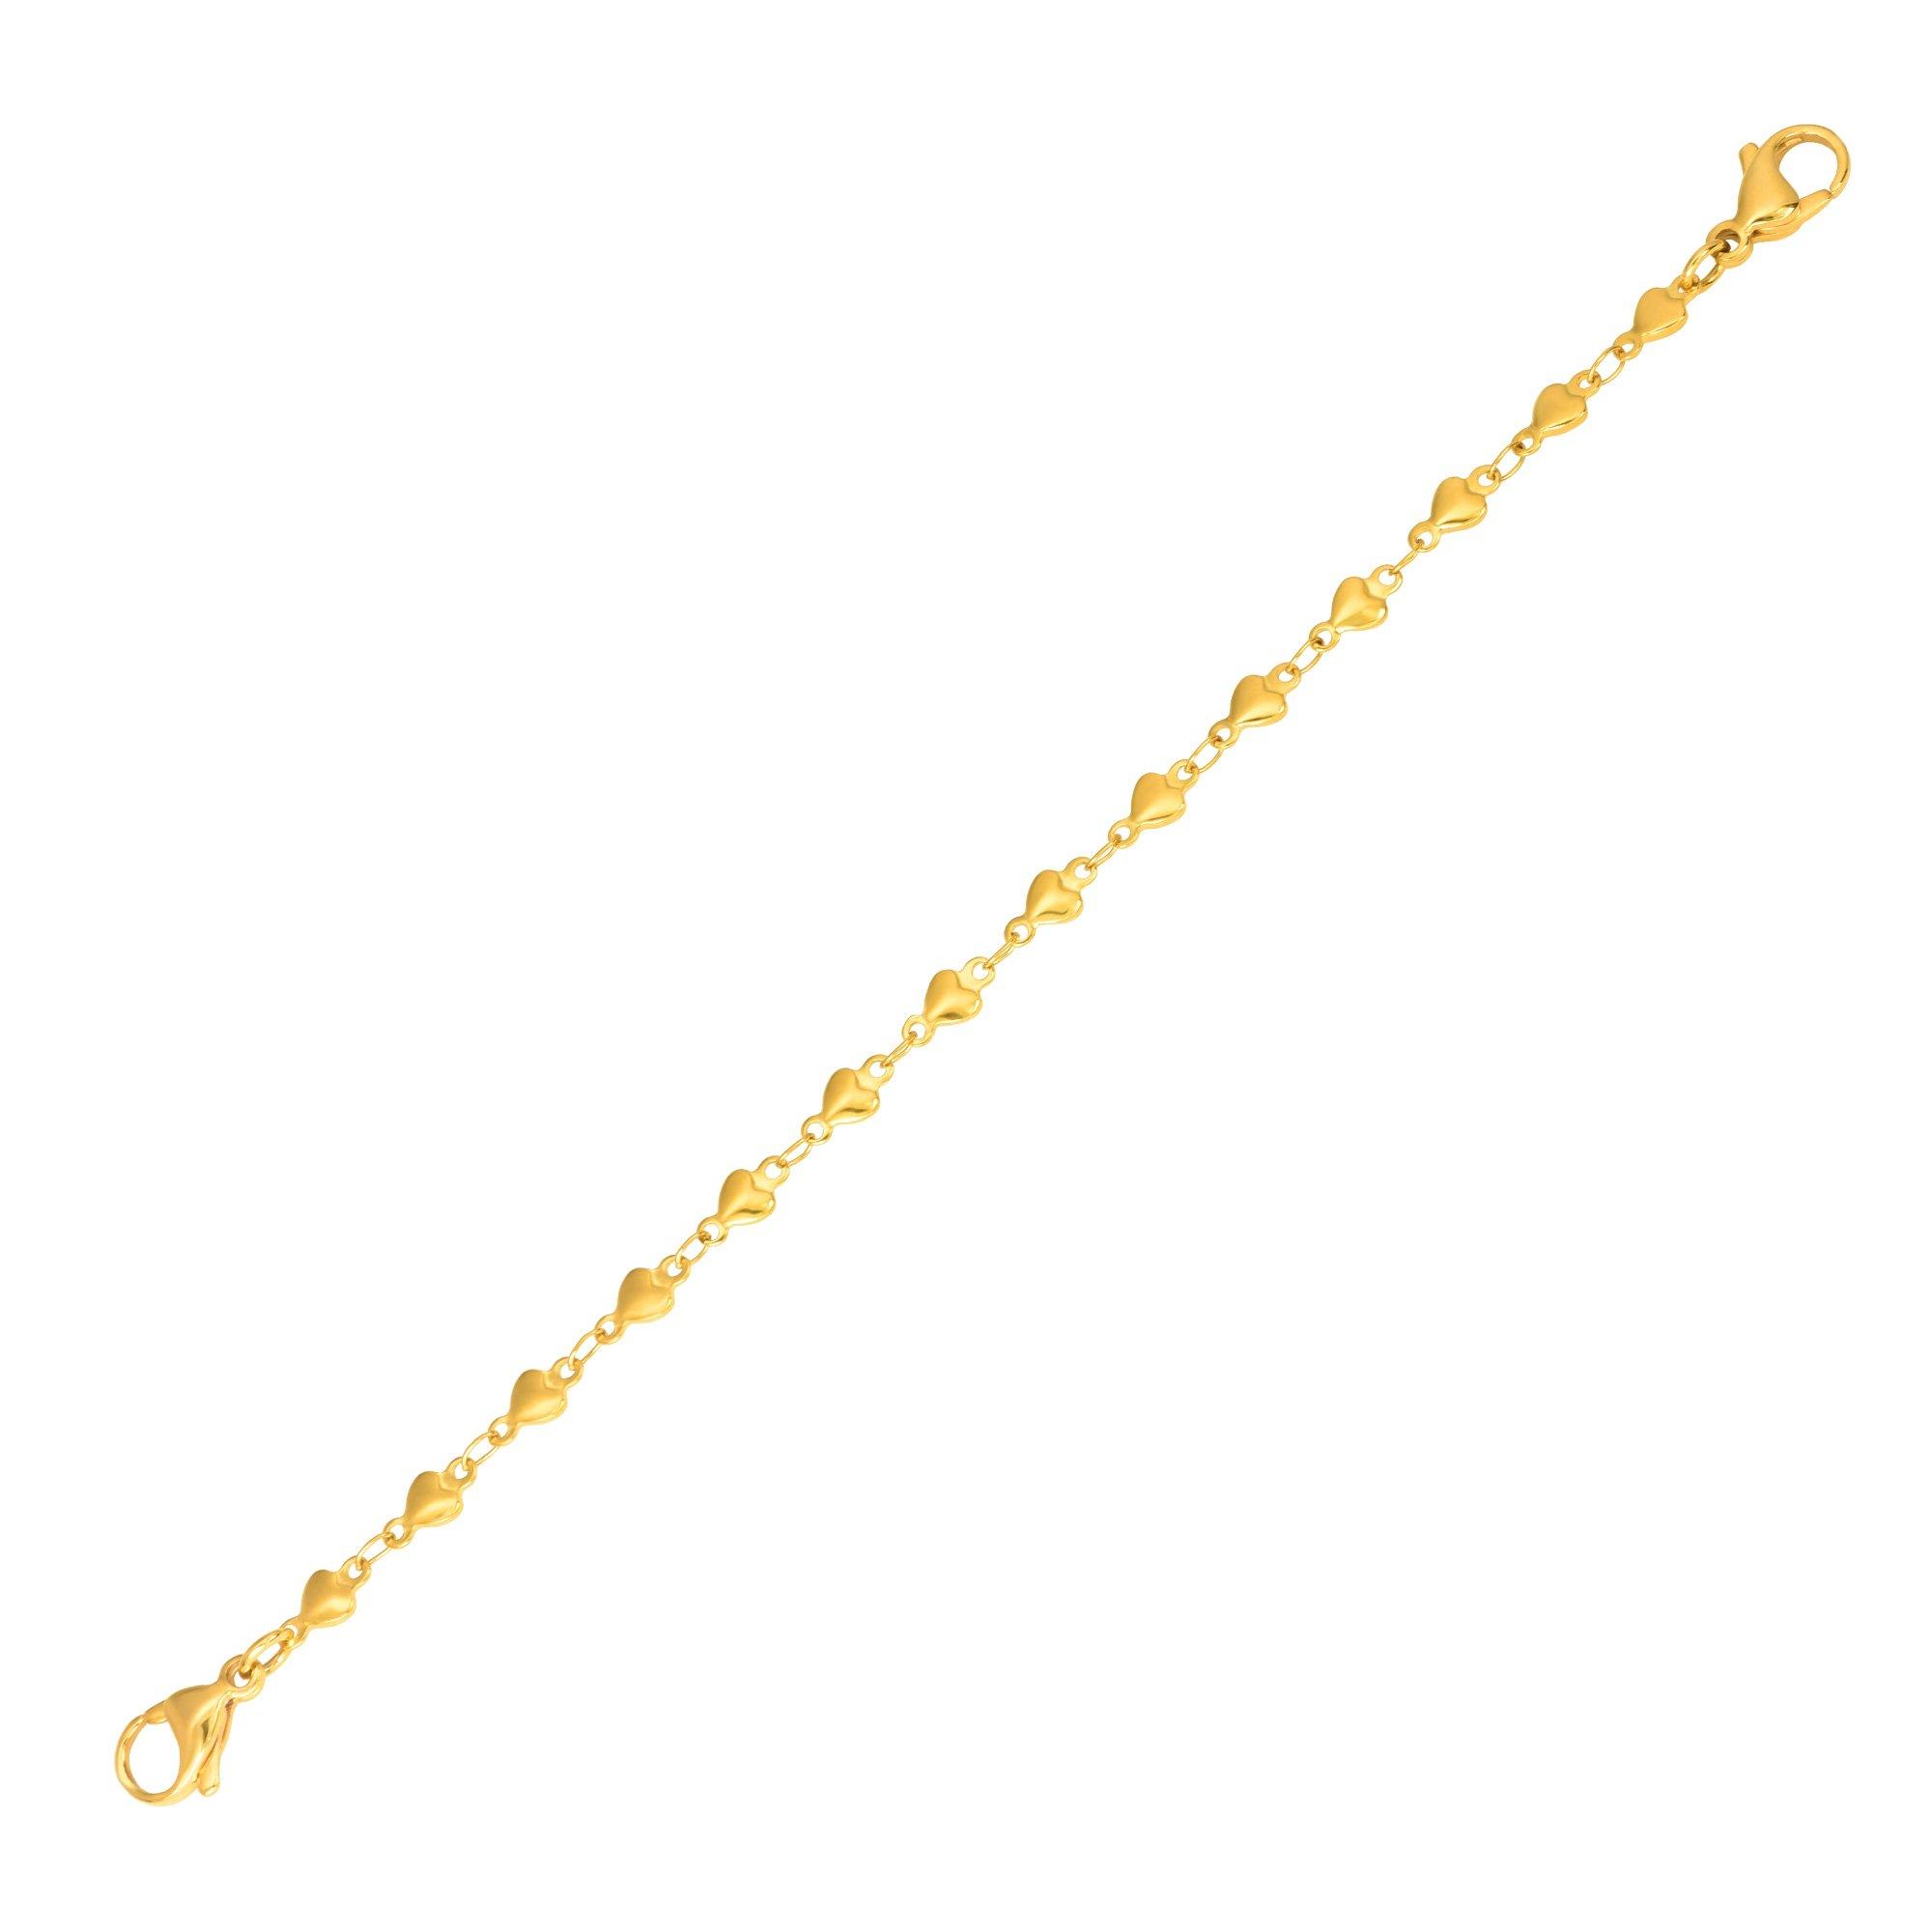 Divoti PVD Gold Heart Link Medical Alert Replacement Bracelet -5.0''